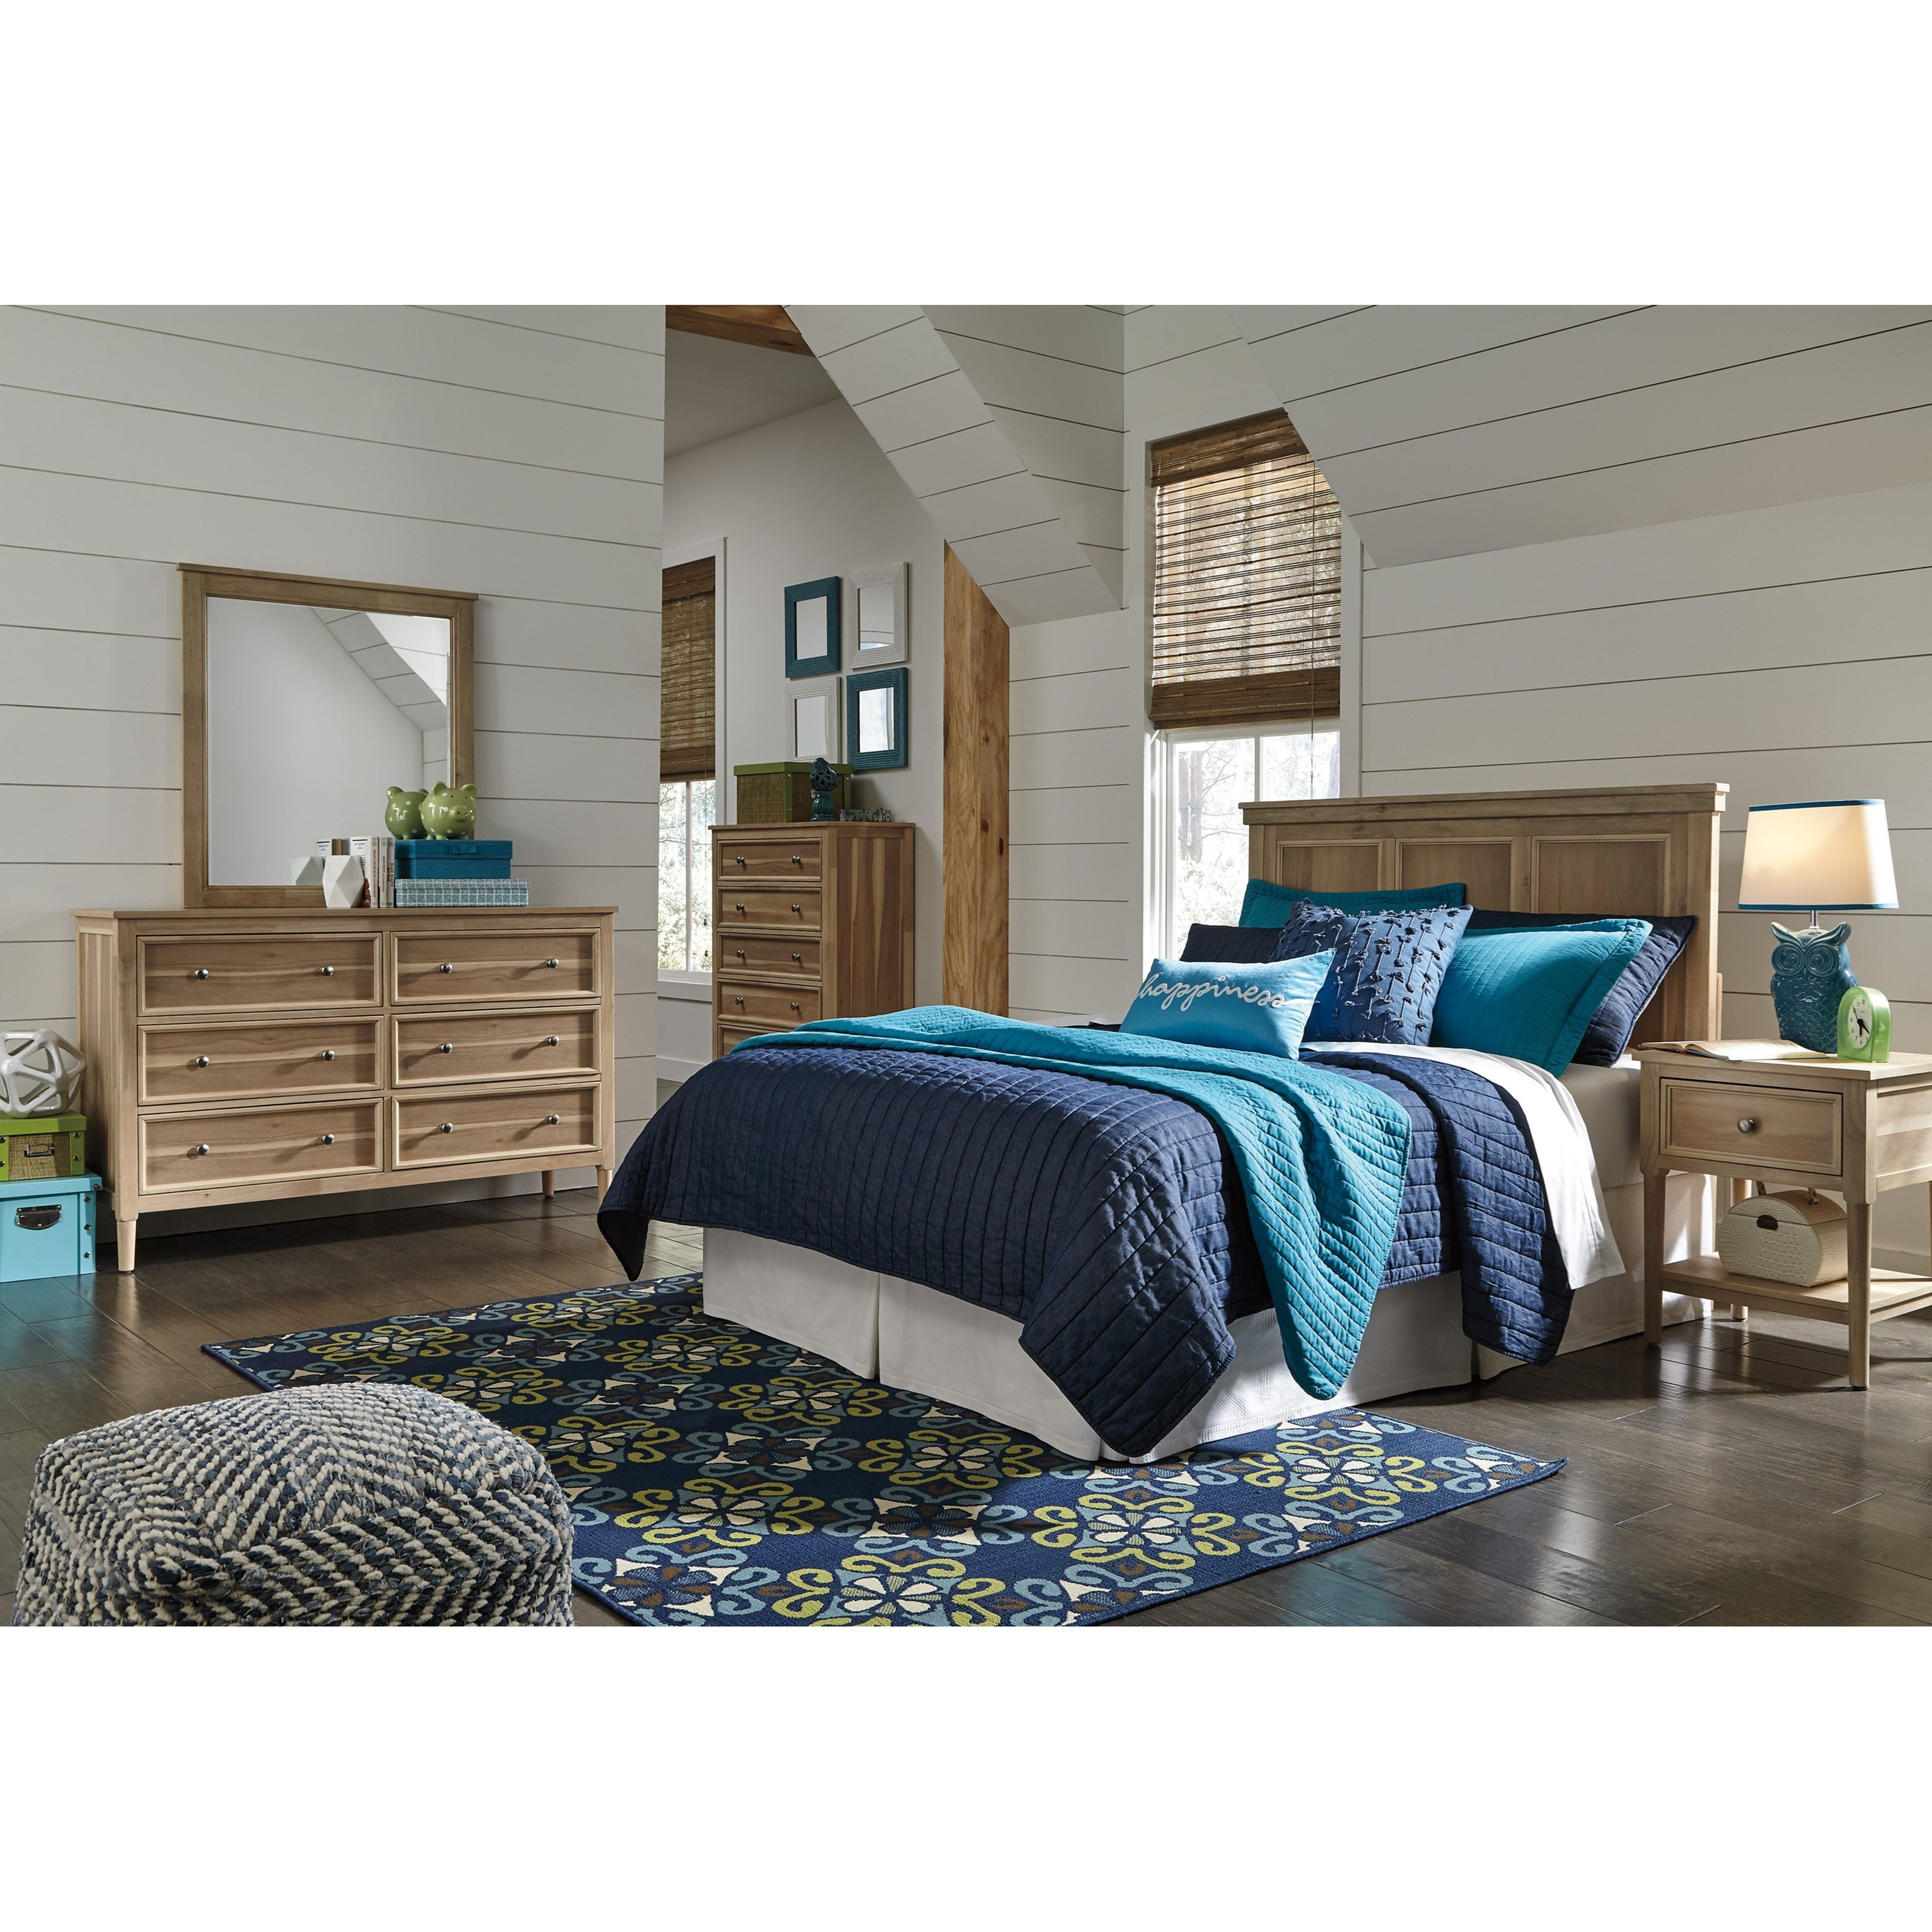 Signature Design by Ashley Klasholm Queen Bedroom Group - Item Number: B512 Q Bedroom Group 4